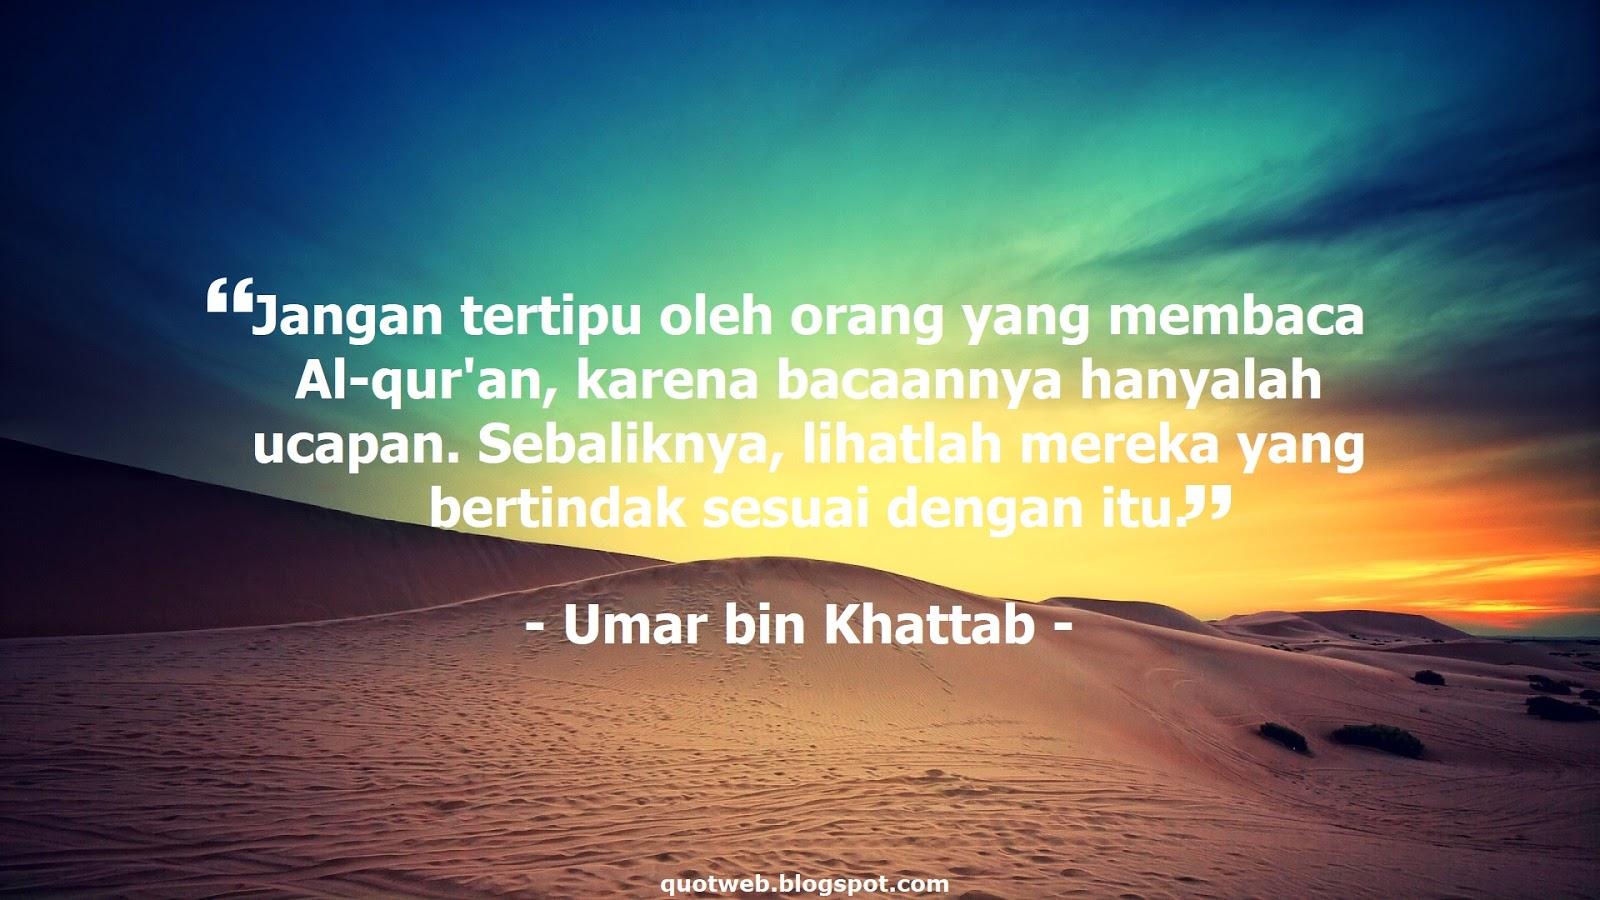 Kata Kata Bijak Umar Bin Khattab Tentang Cinta Cikimmcom